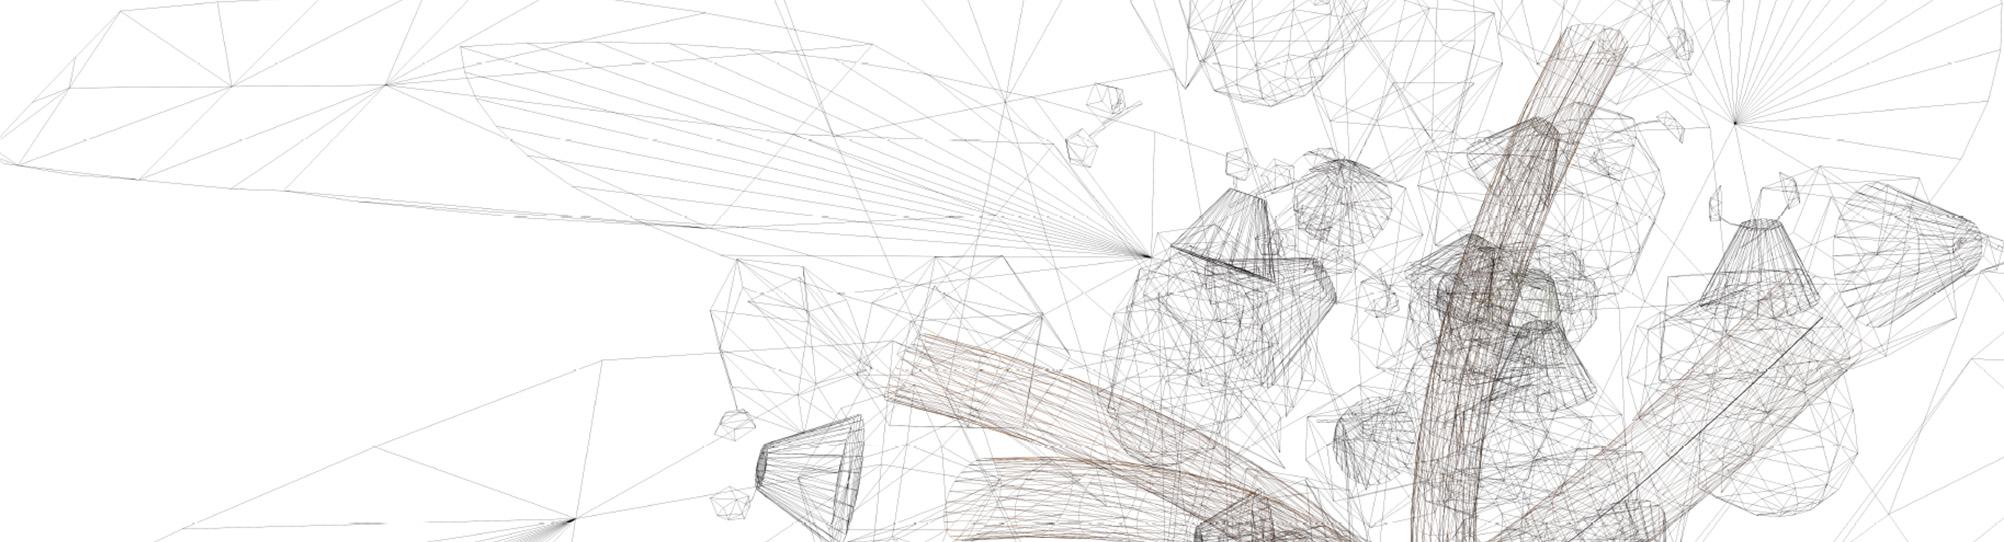 Dominika Batista PhD architectural design method